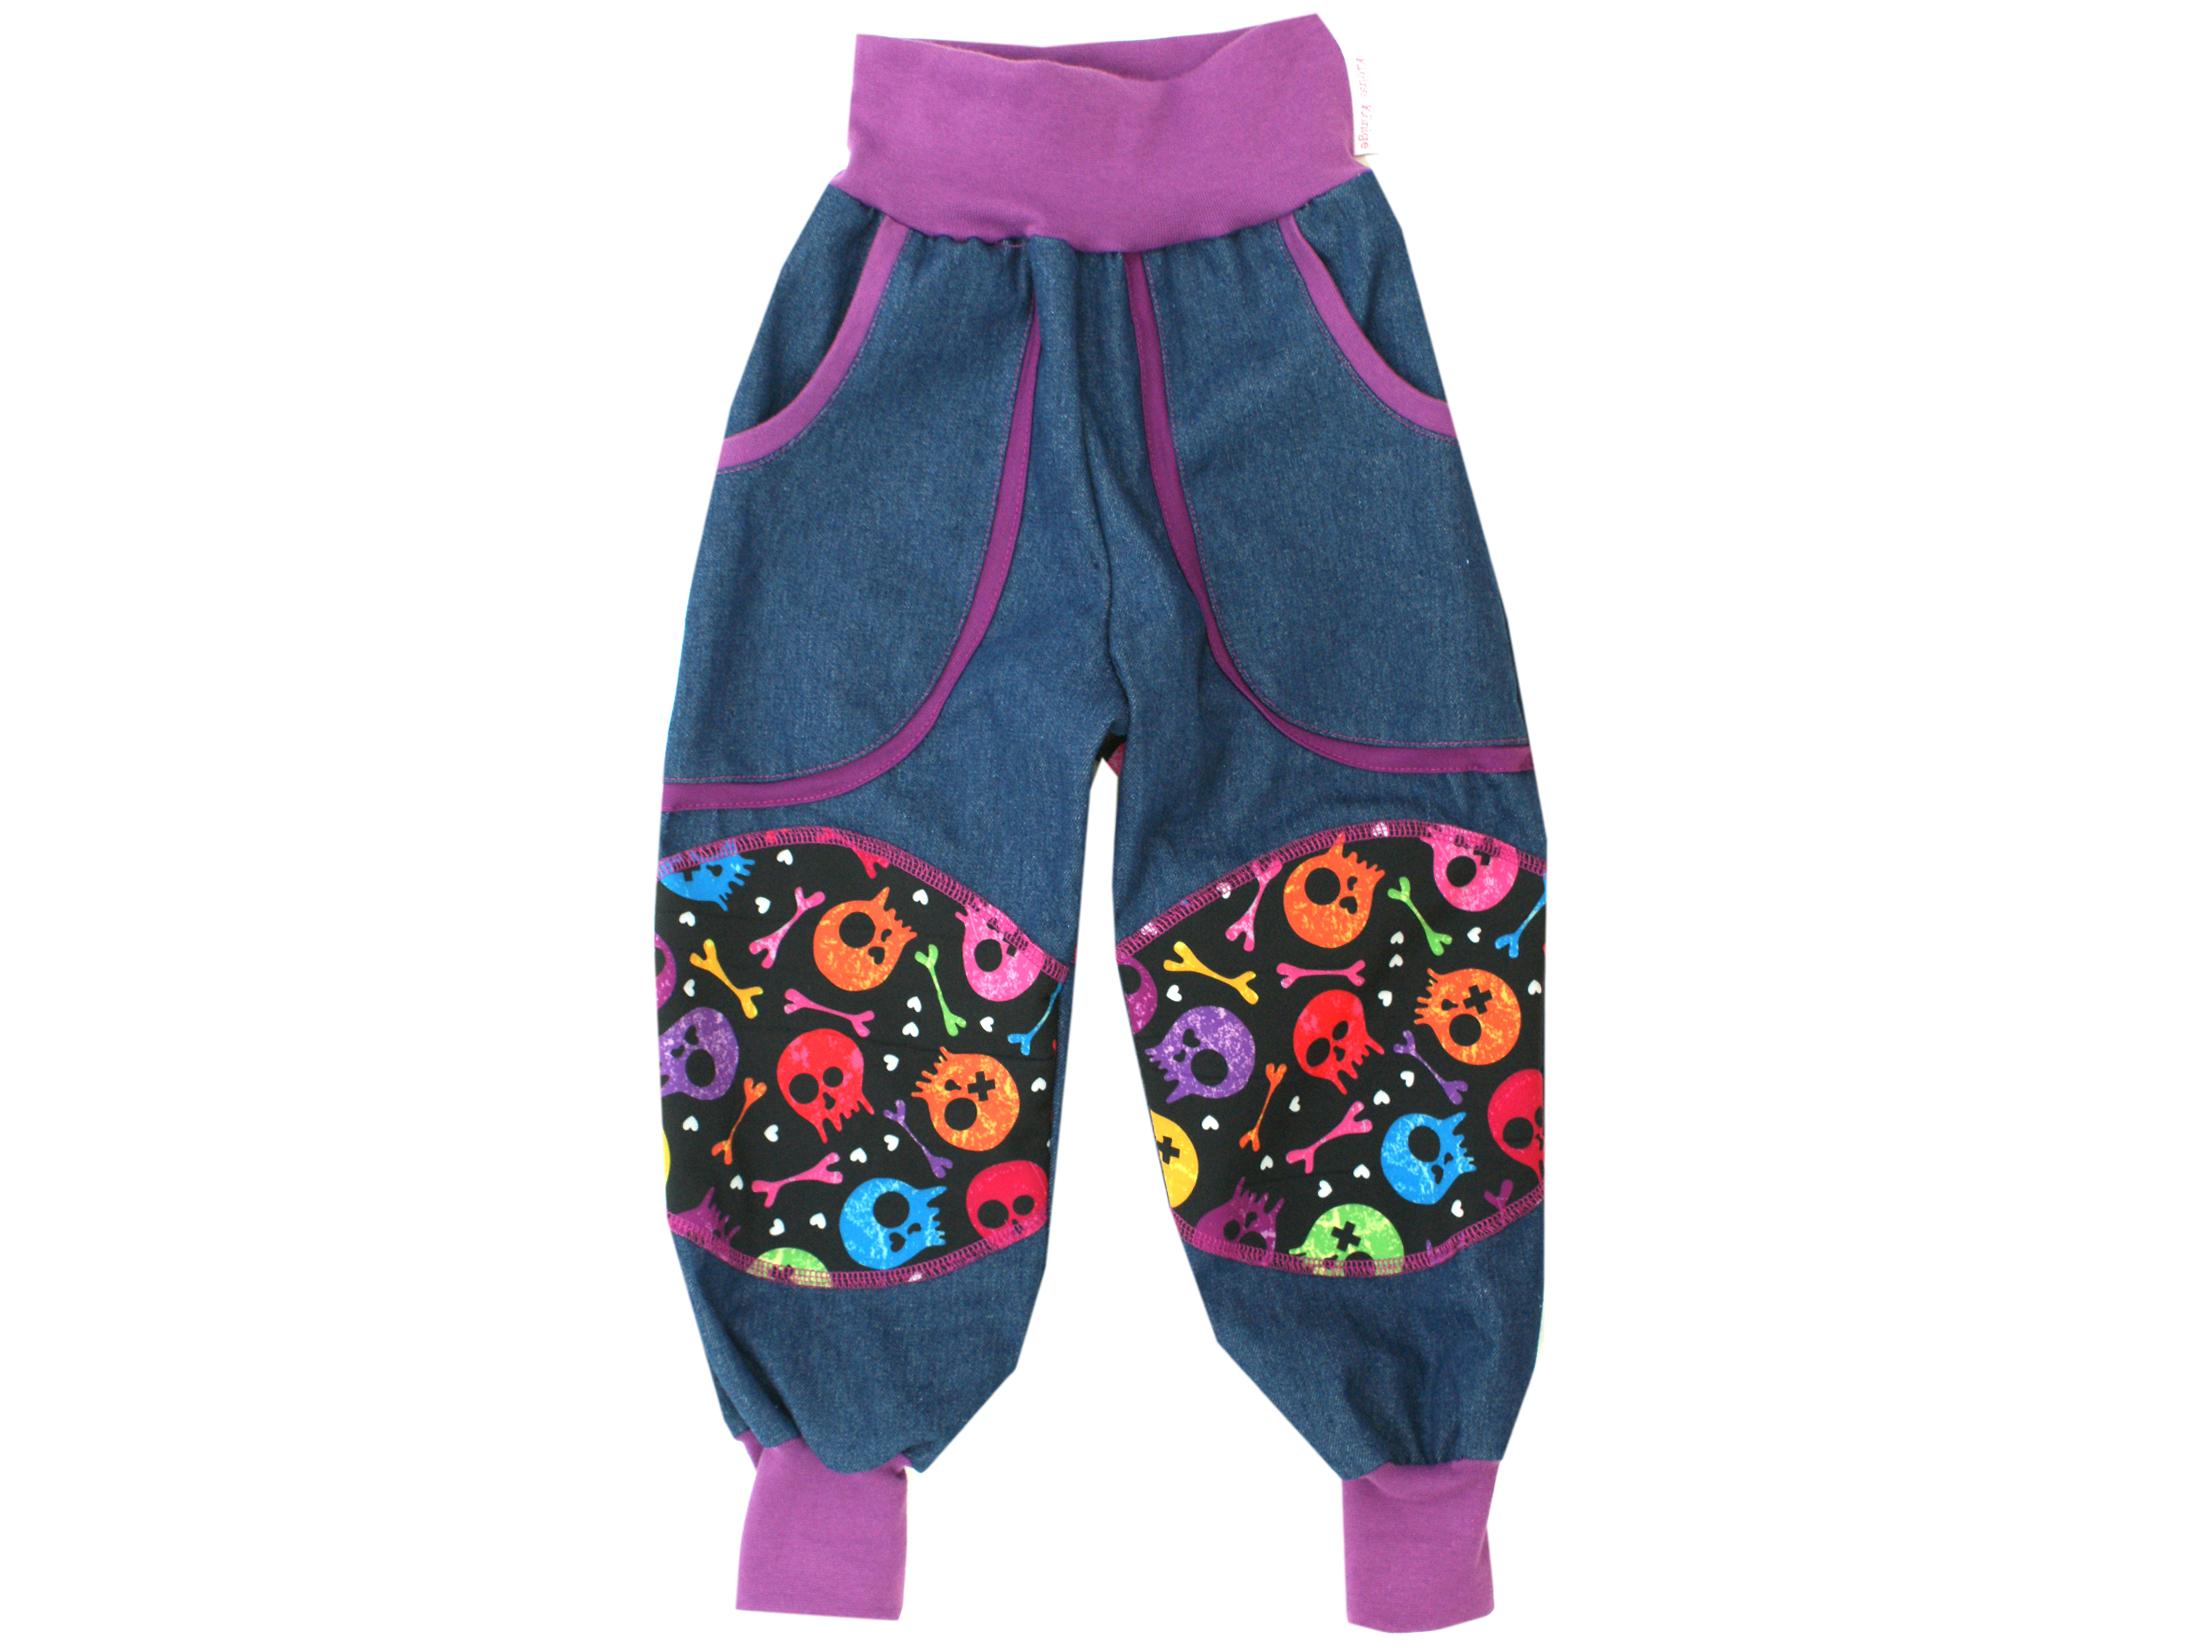 "Kinder Outdoorhose Jeans Räuberhose ""Colourful Skulls"" lila schwarz"